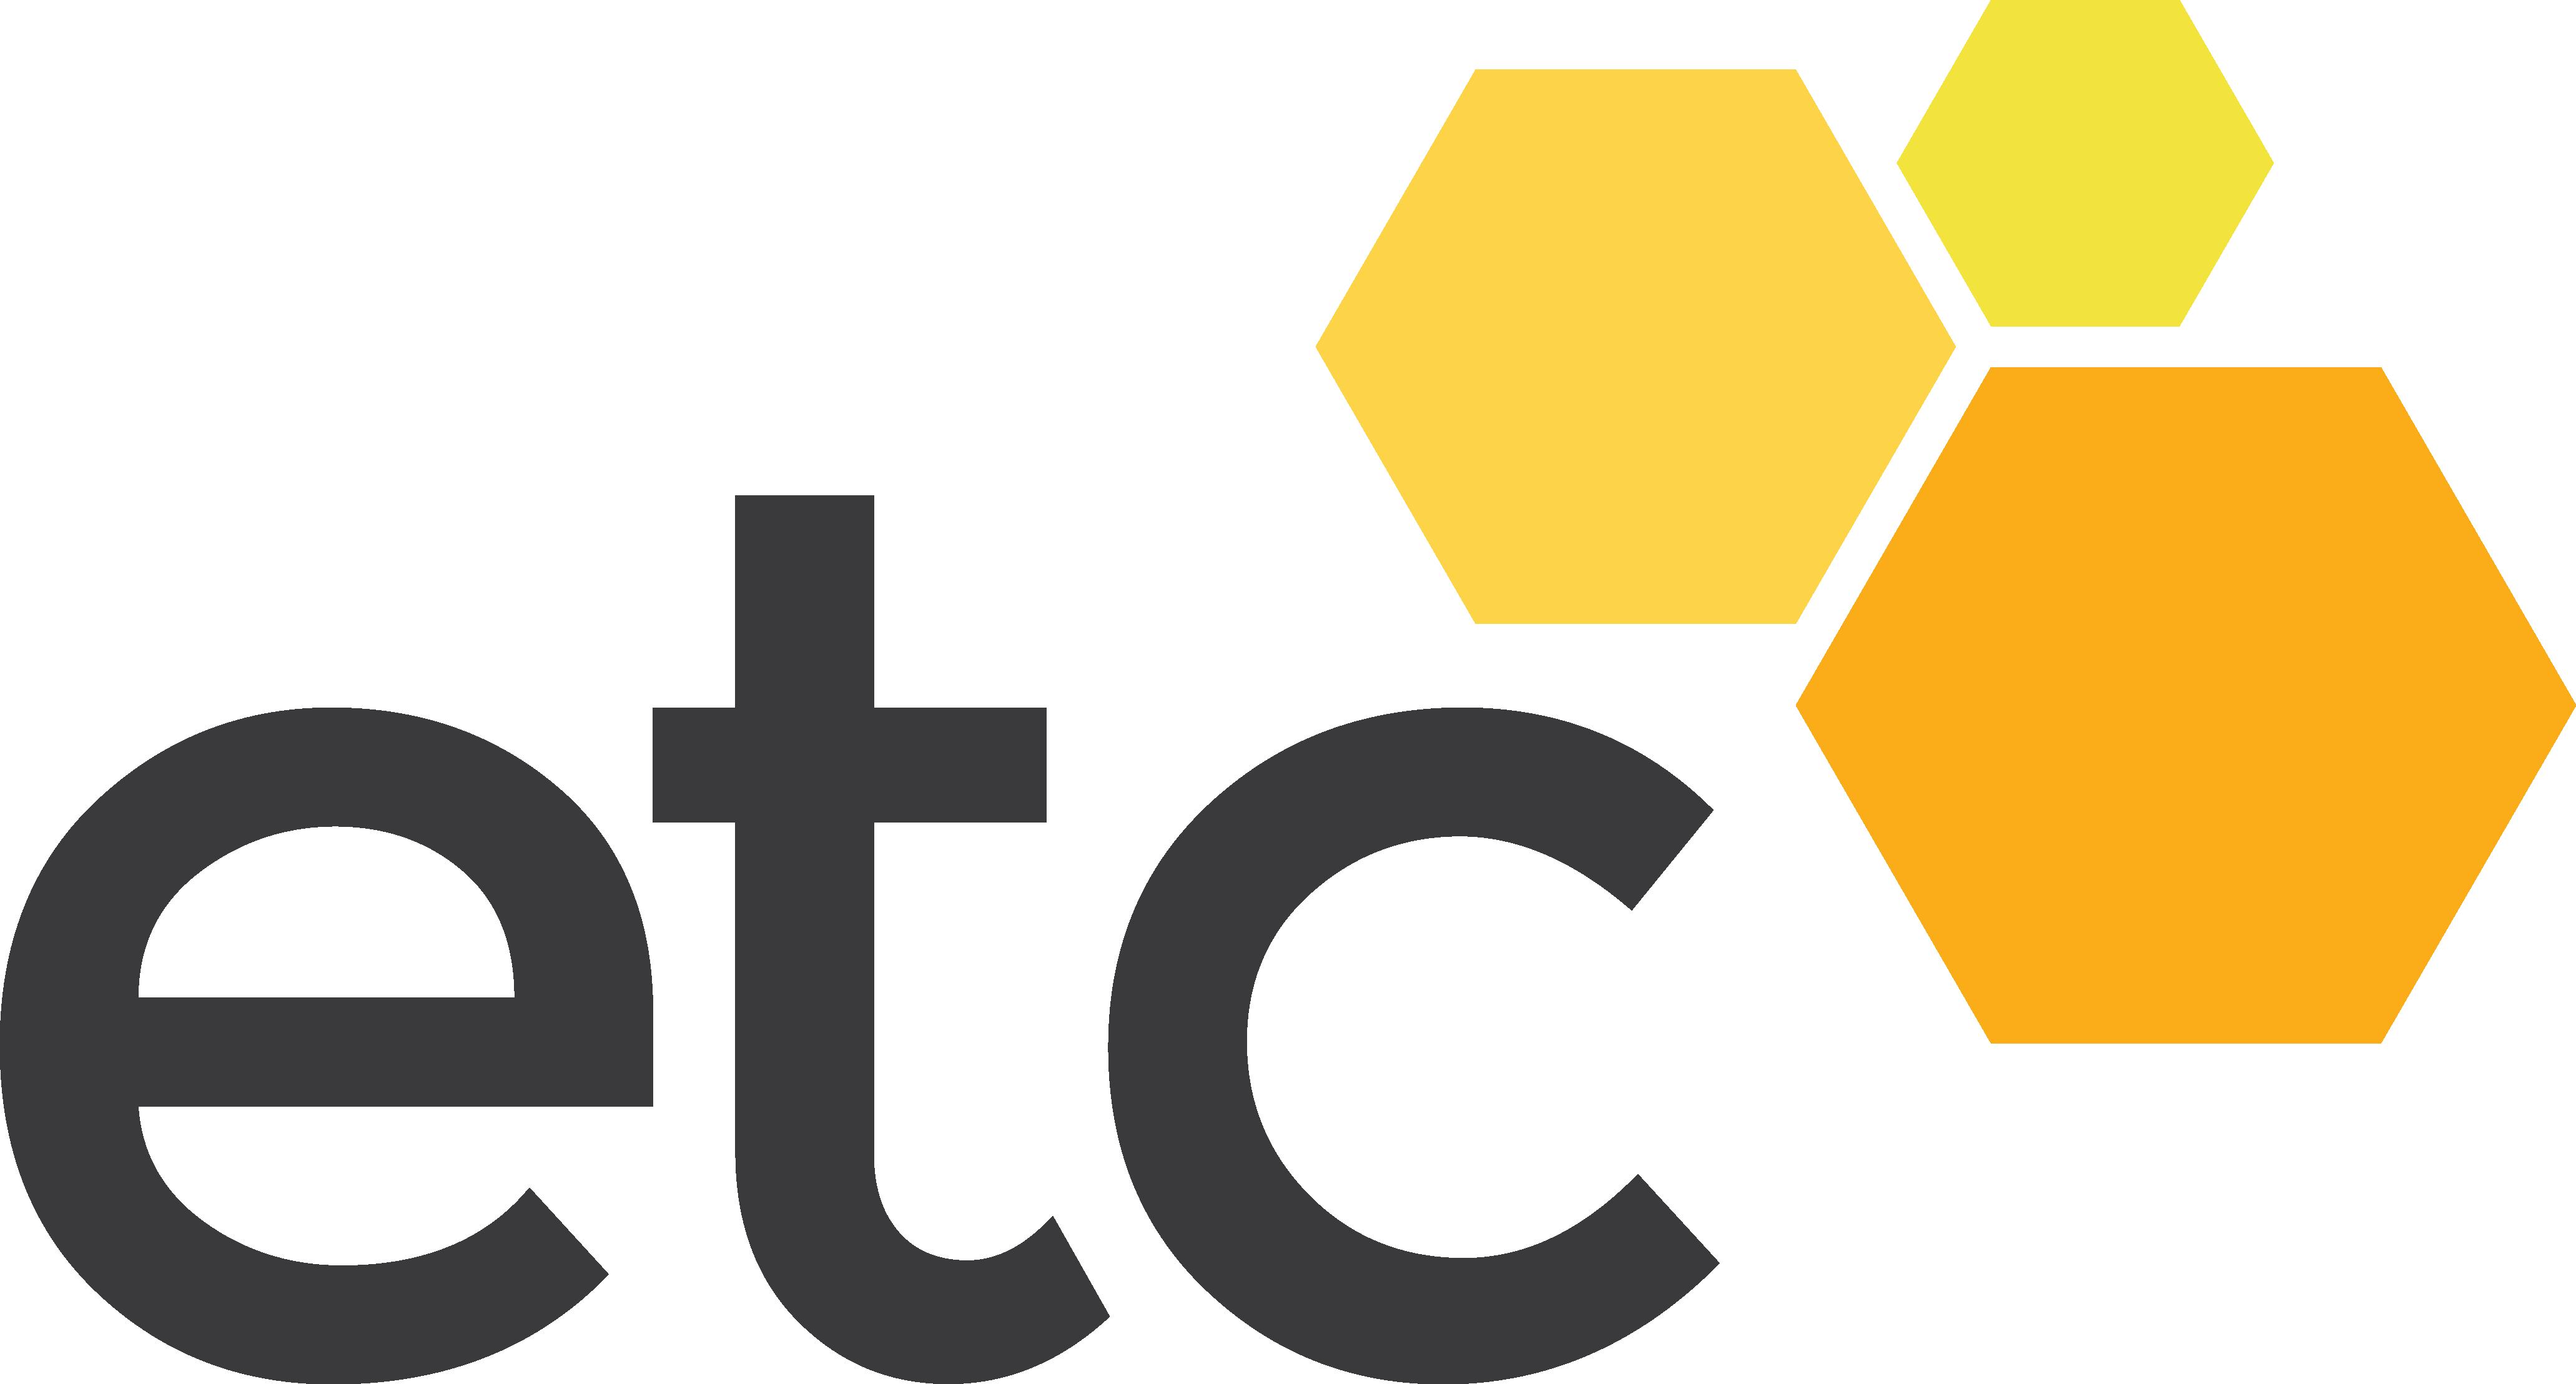 ETC (Emerging Technology Centers)